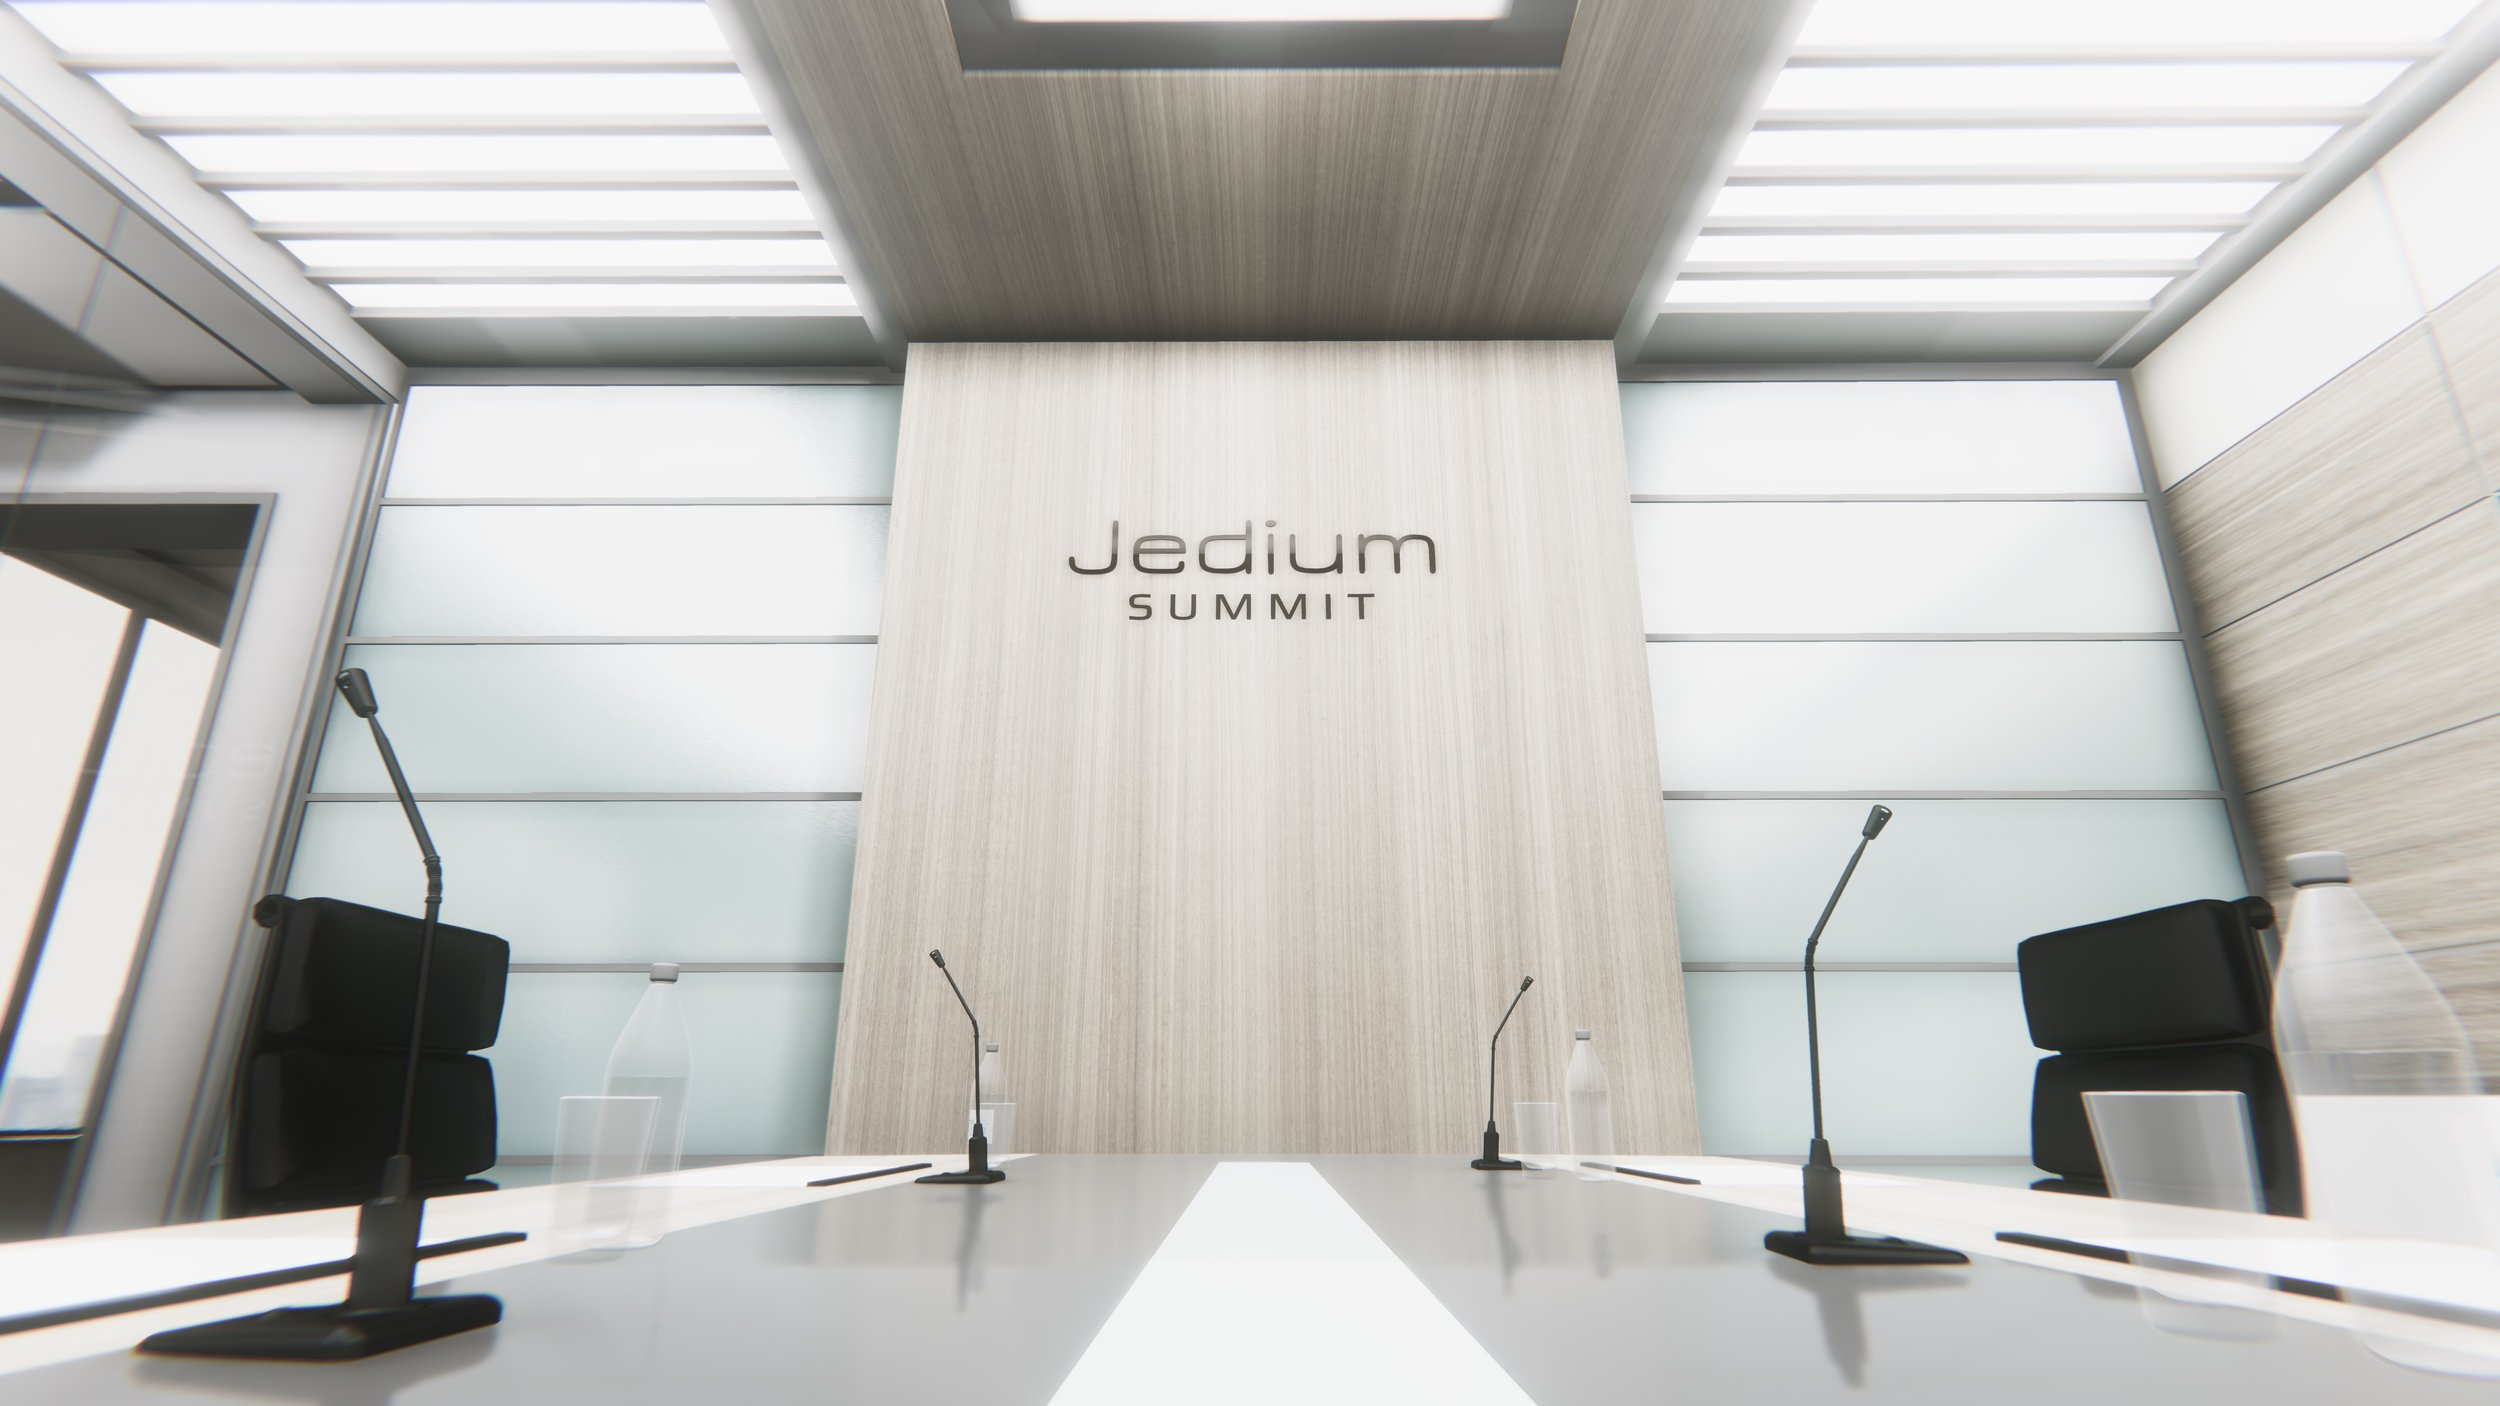 jedium_summit